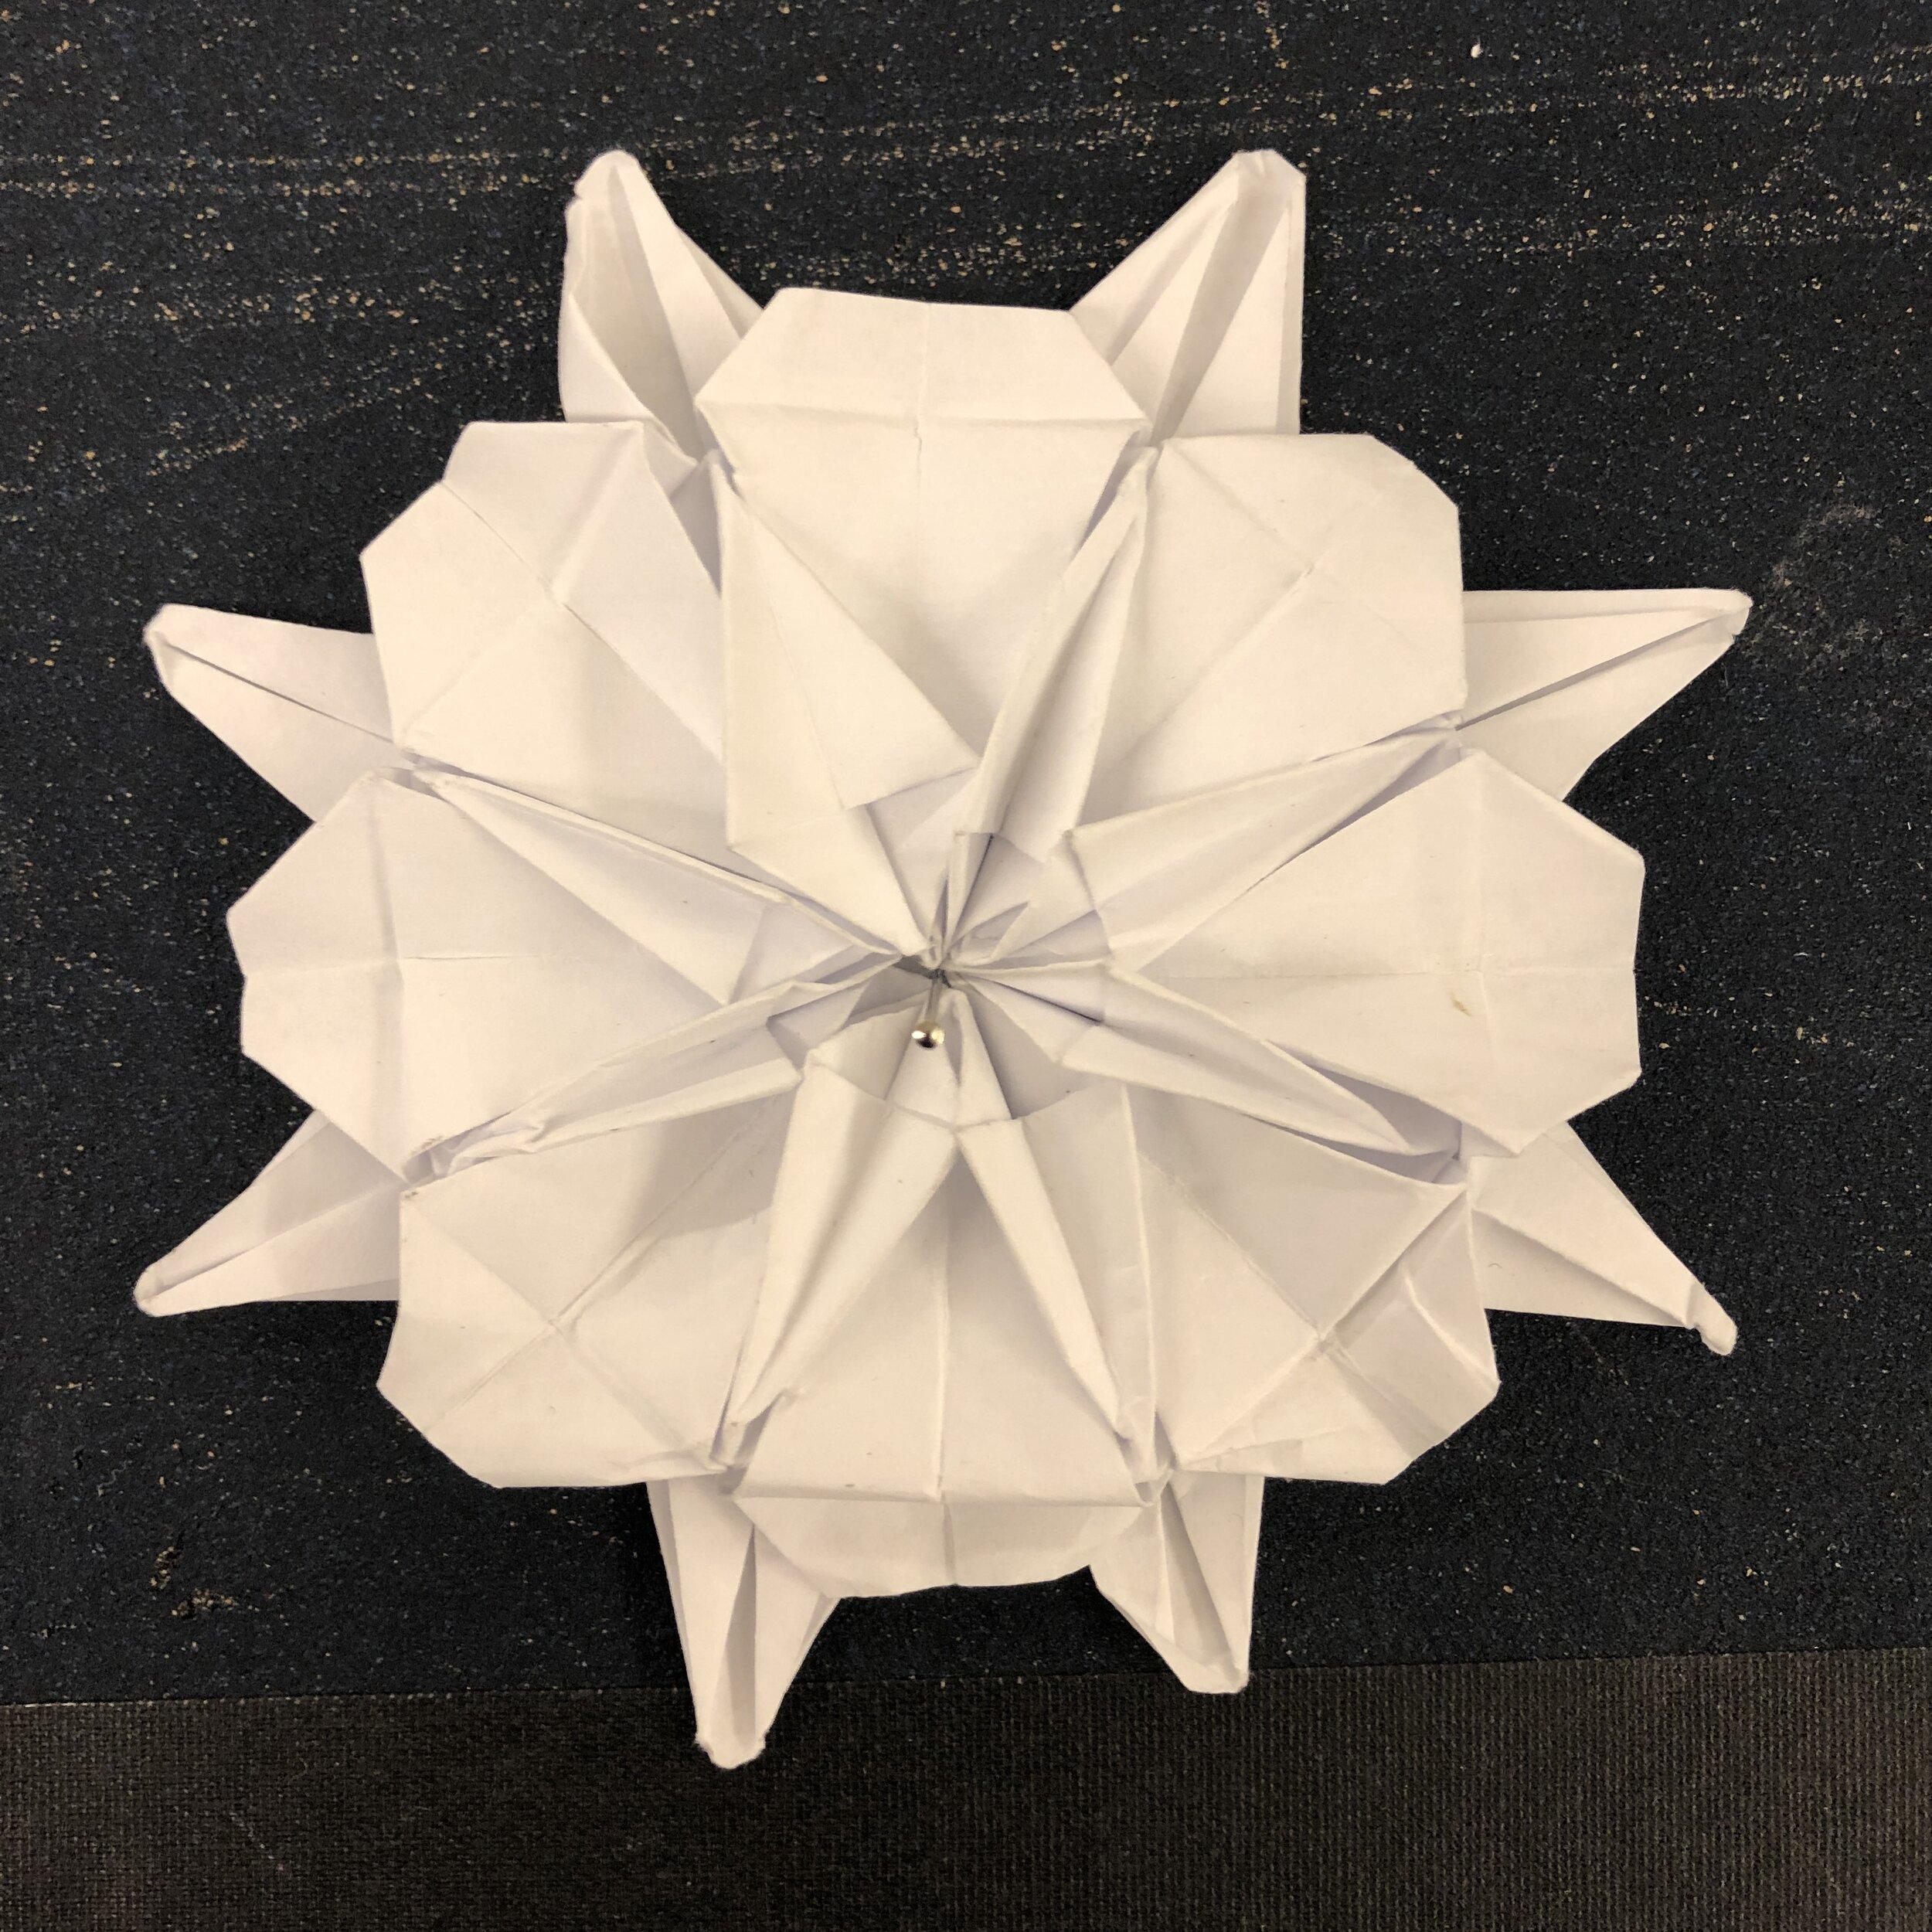 Origami eight-pointed chrysanthemum mock. New York City, September 2019